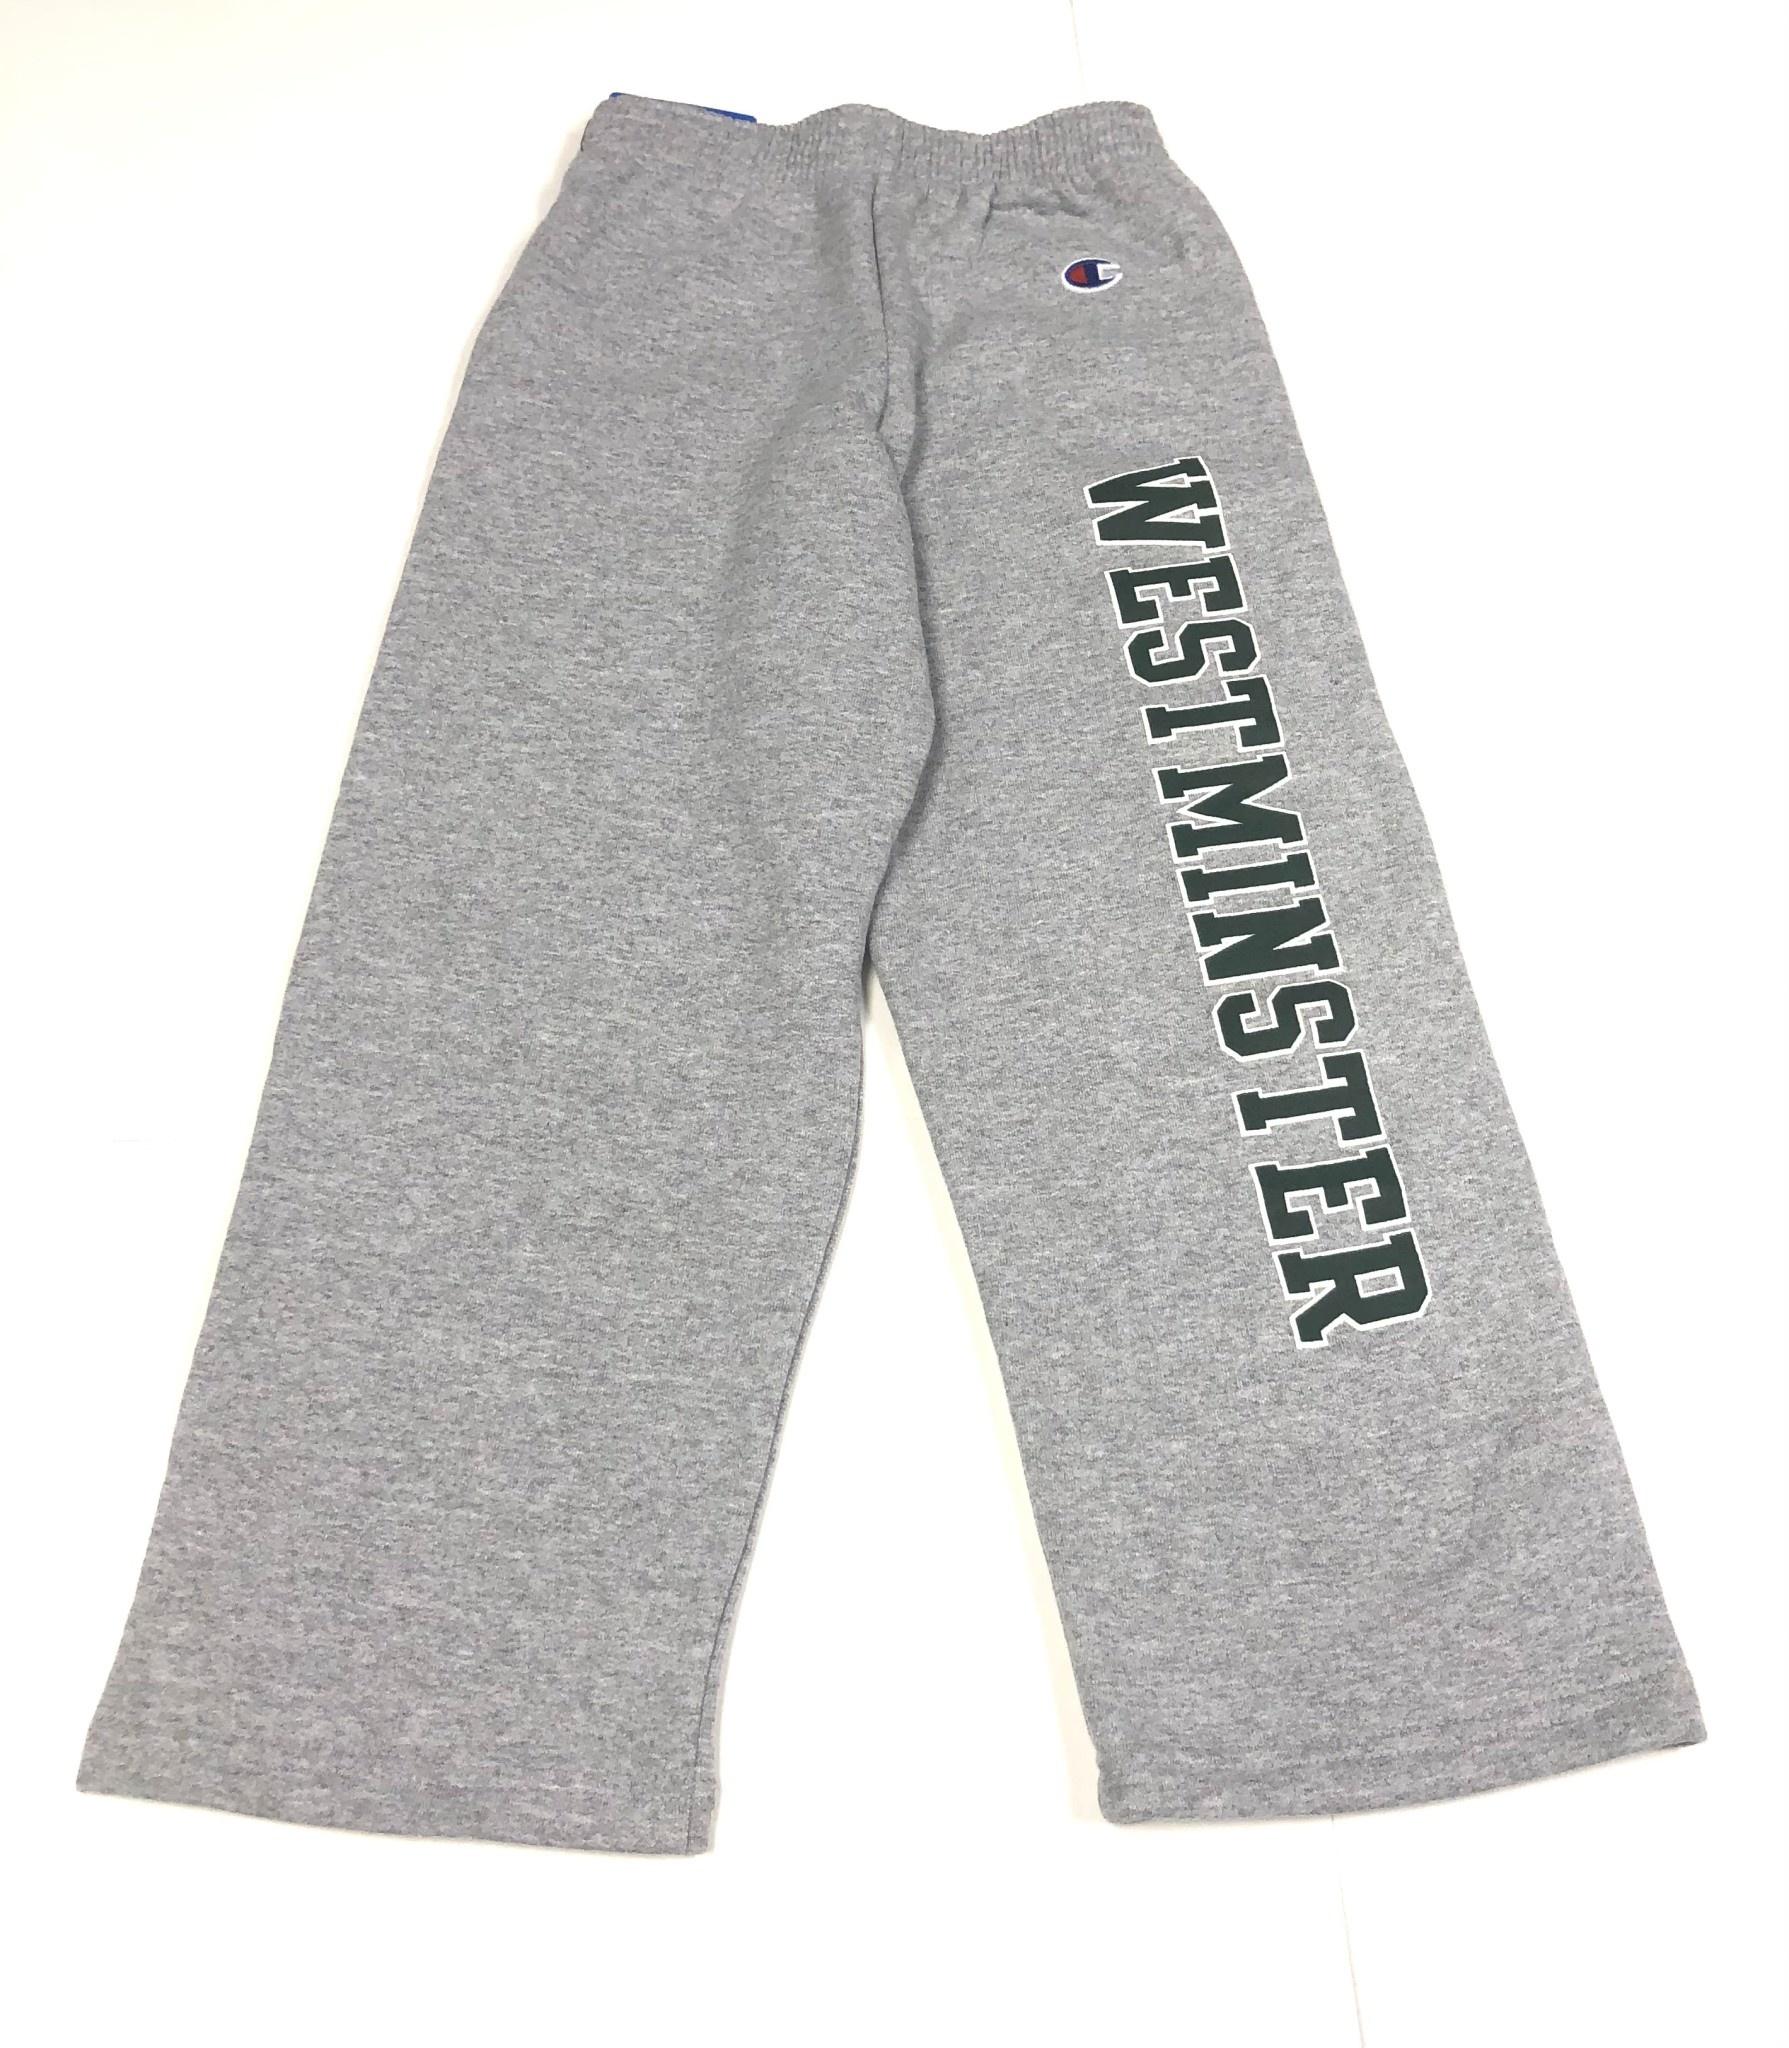 Champion Sweatpants: Champion Gray w/Westminster down leg - open bottom